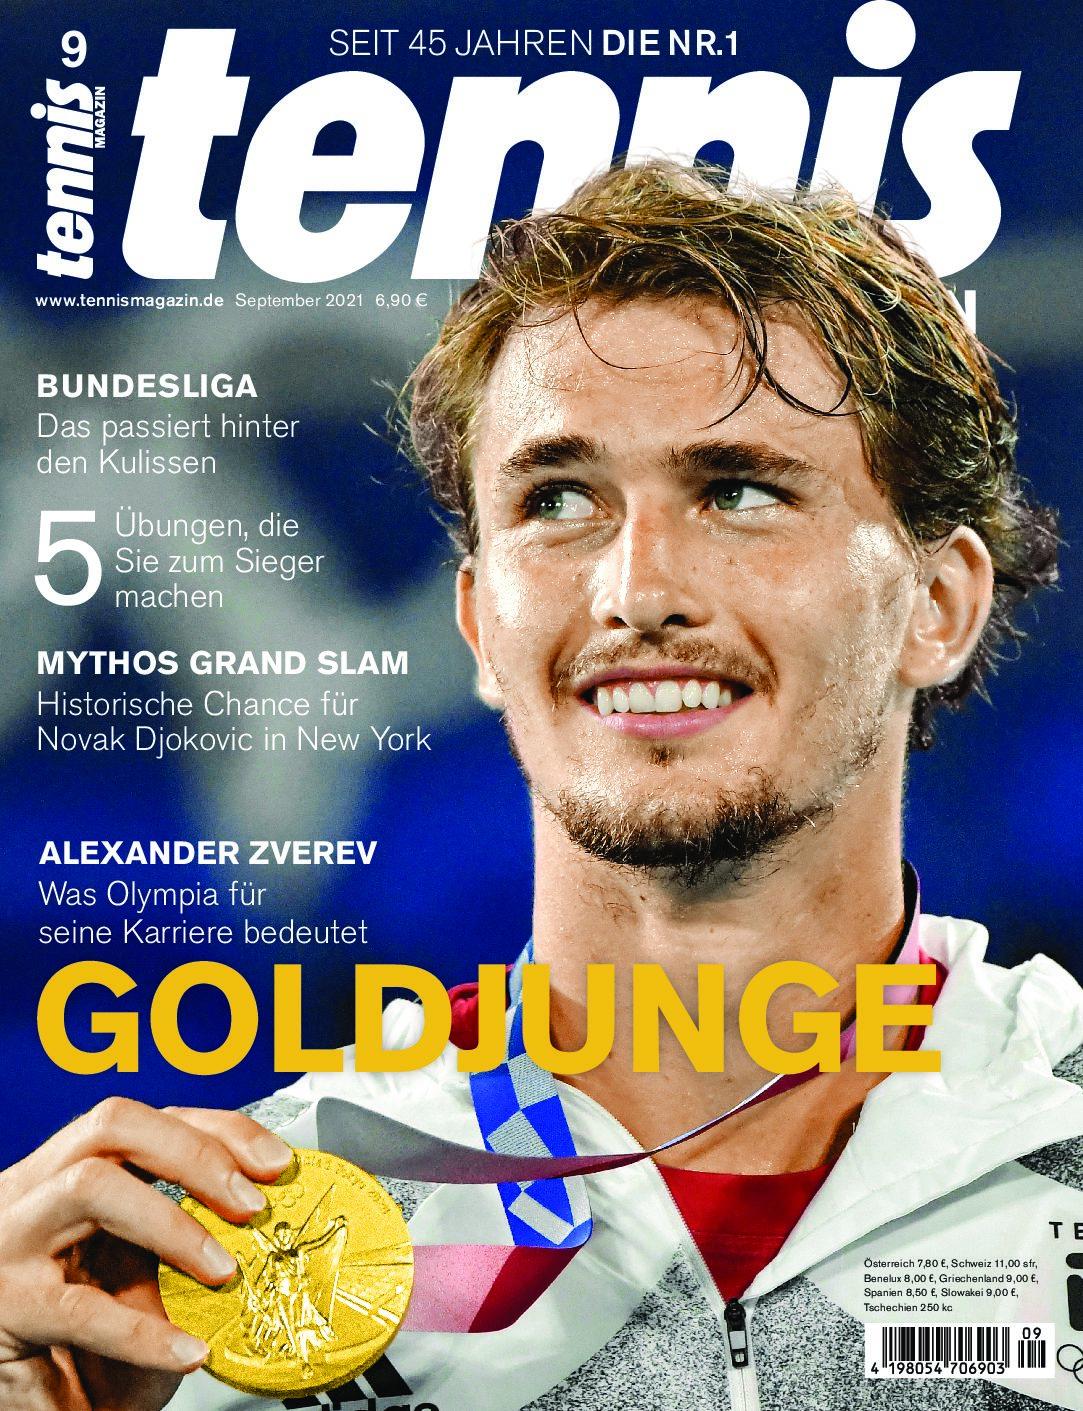 tennis MAGAZIN 09/2021: Goldjunge Alexander Zverev